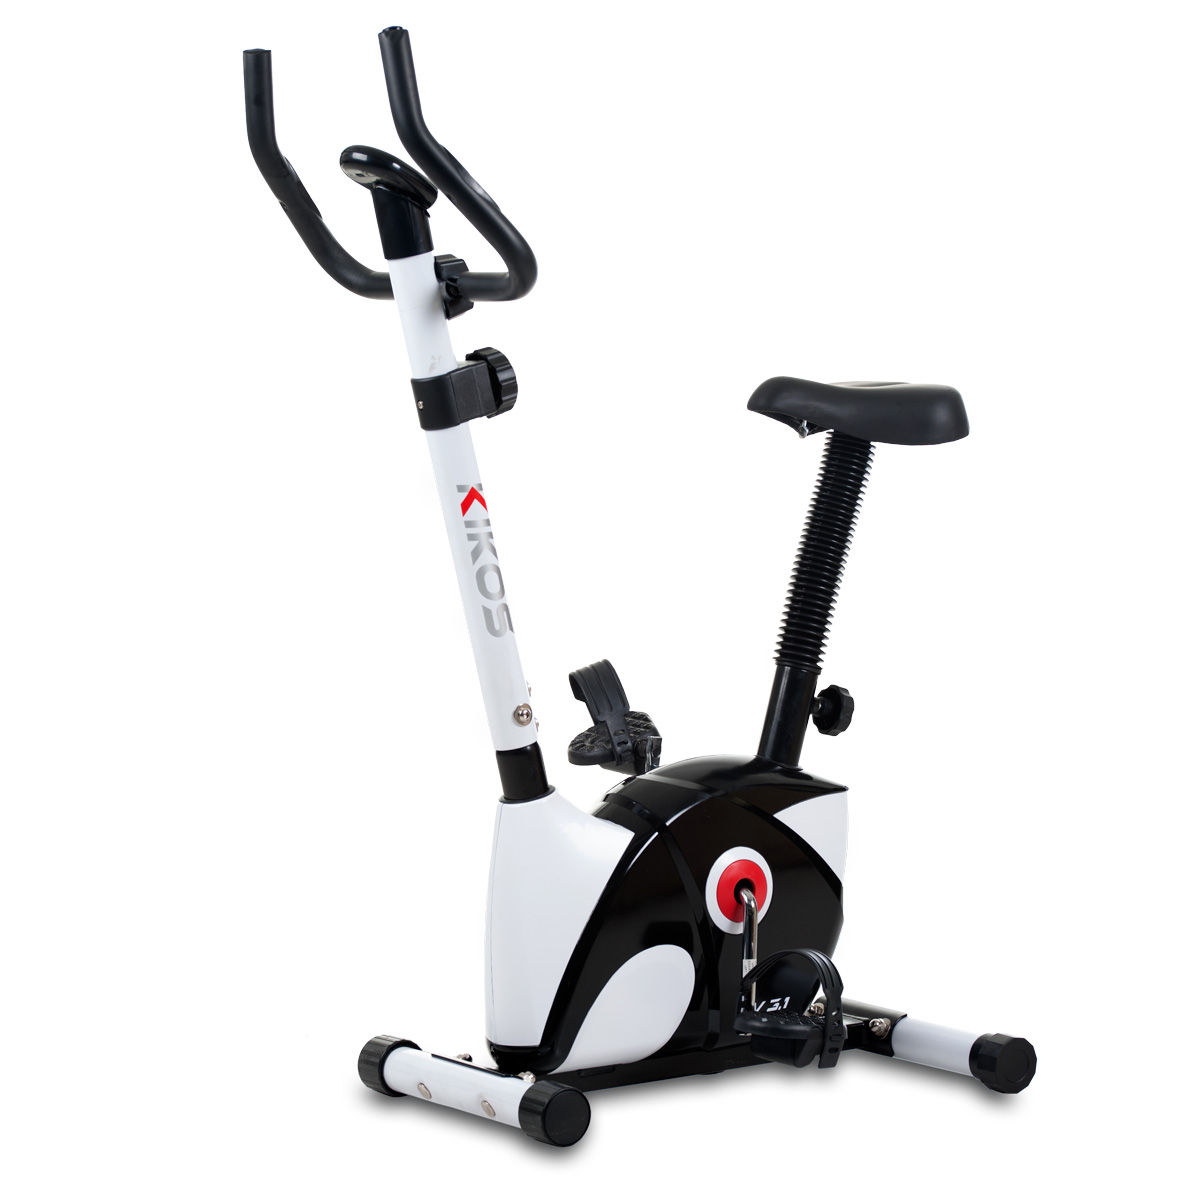 bibicleta - Bicicleta Ergométrica Kikos KV3.1I - R$ 759,90